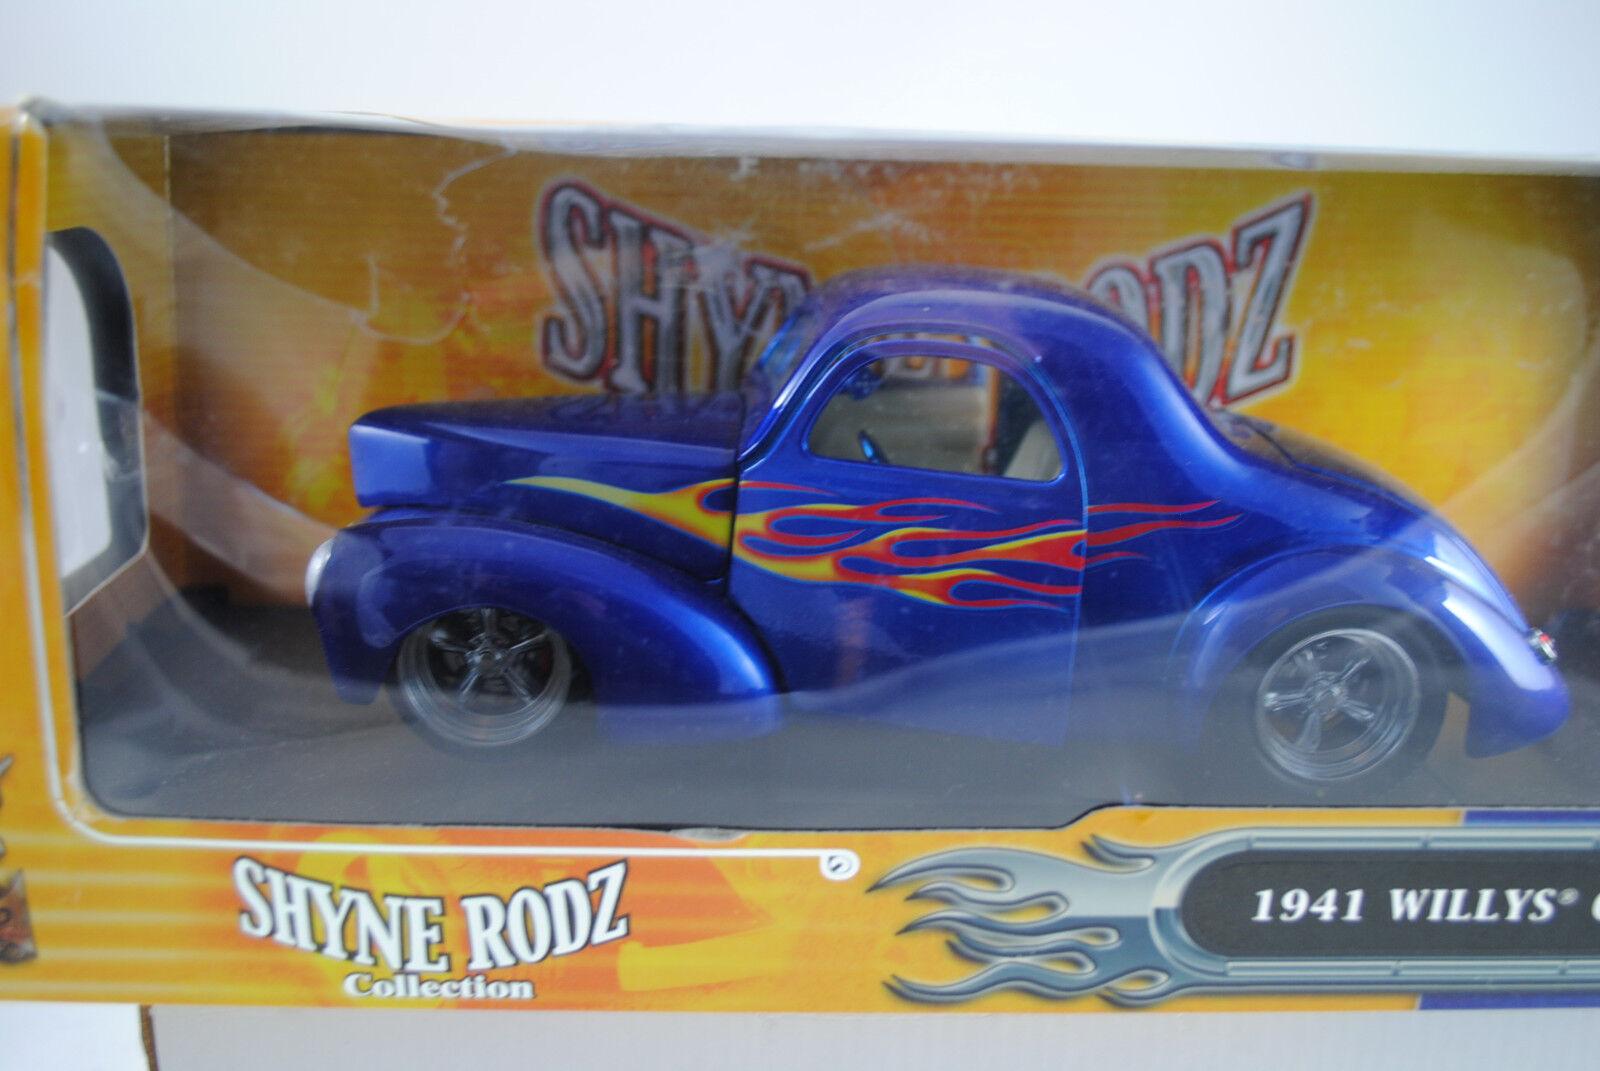 1 18 Roads Roads Roads Legends Shyne Rodz  1941 Willys Coupe bluee RARITÄT - neu OVP  75b8e0